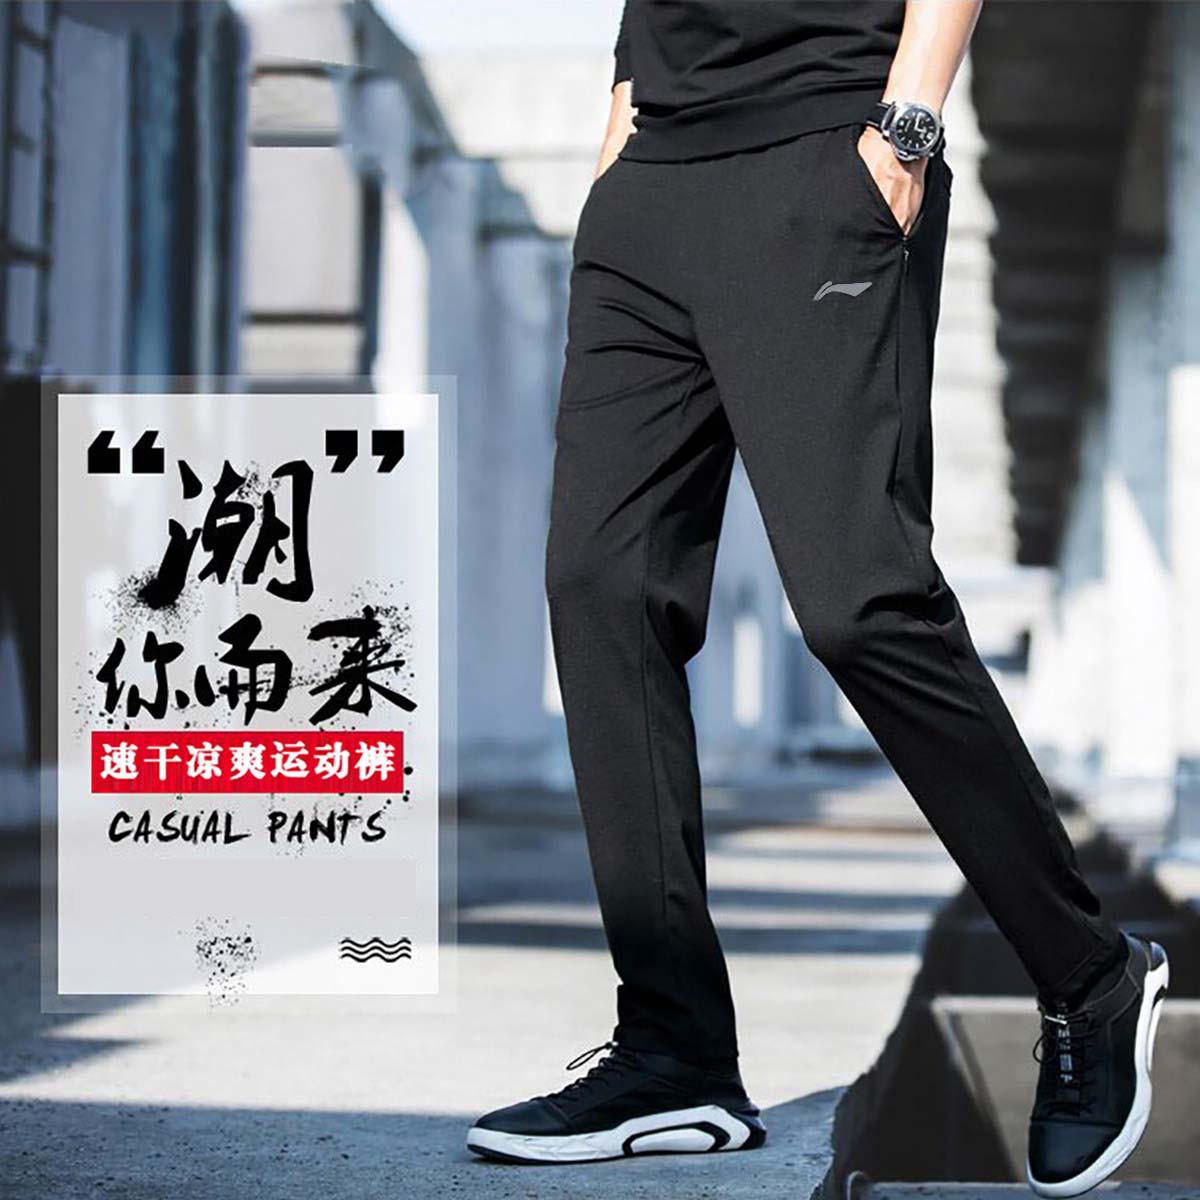 LI-NING 李宁 运动裤男夏季运动休闲透气薄款运动长裤 黑色 M